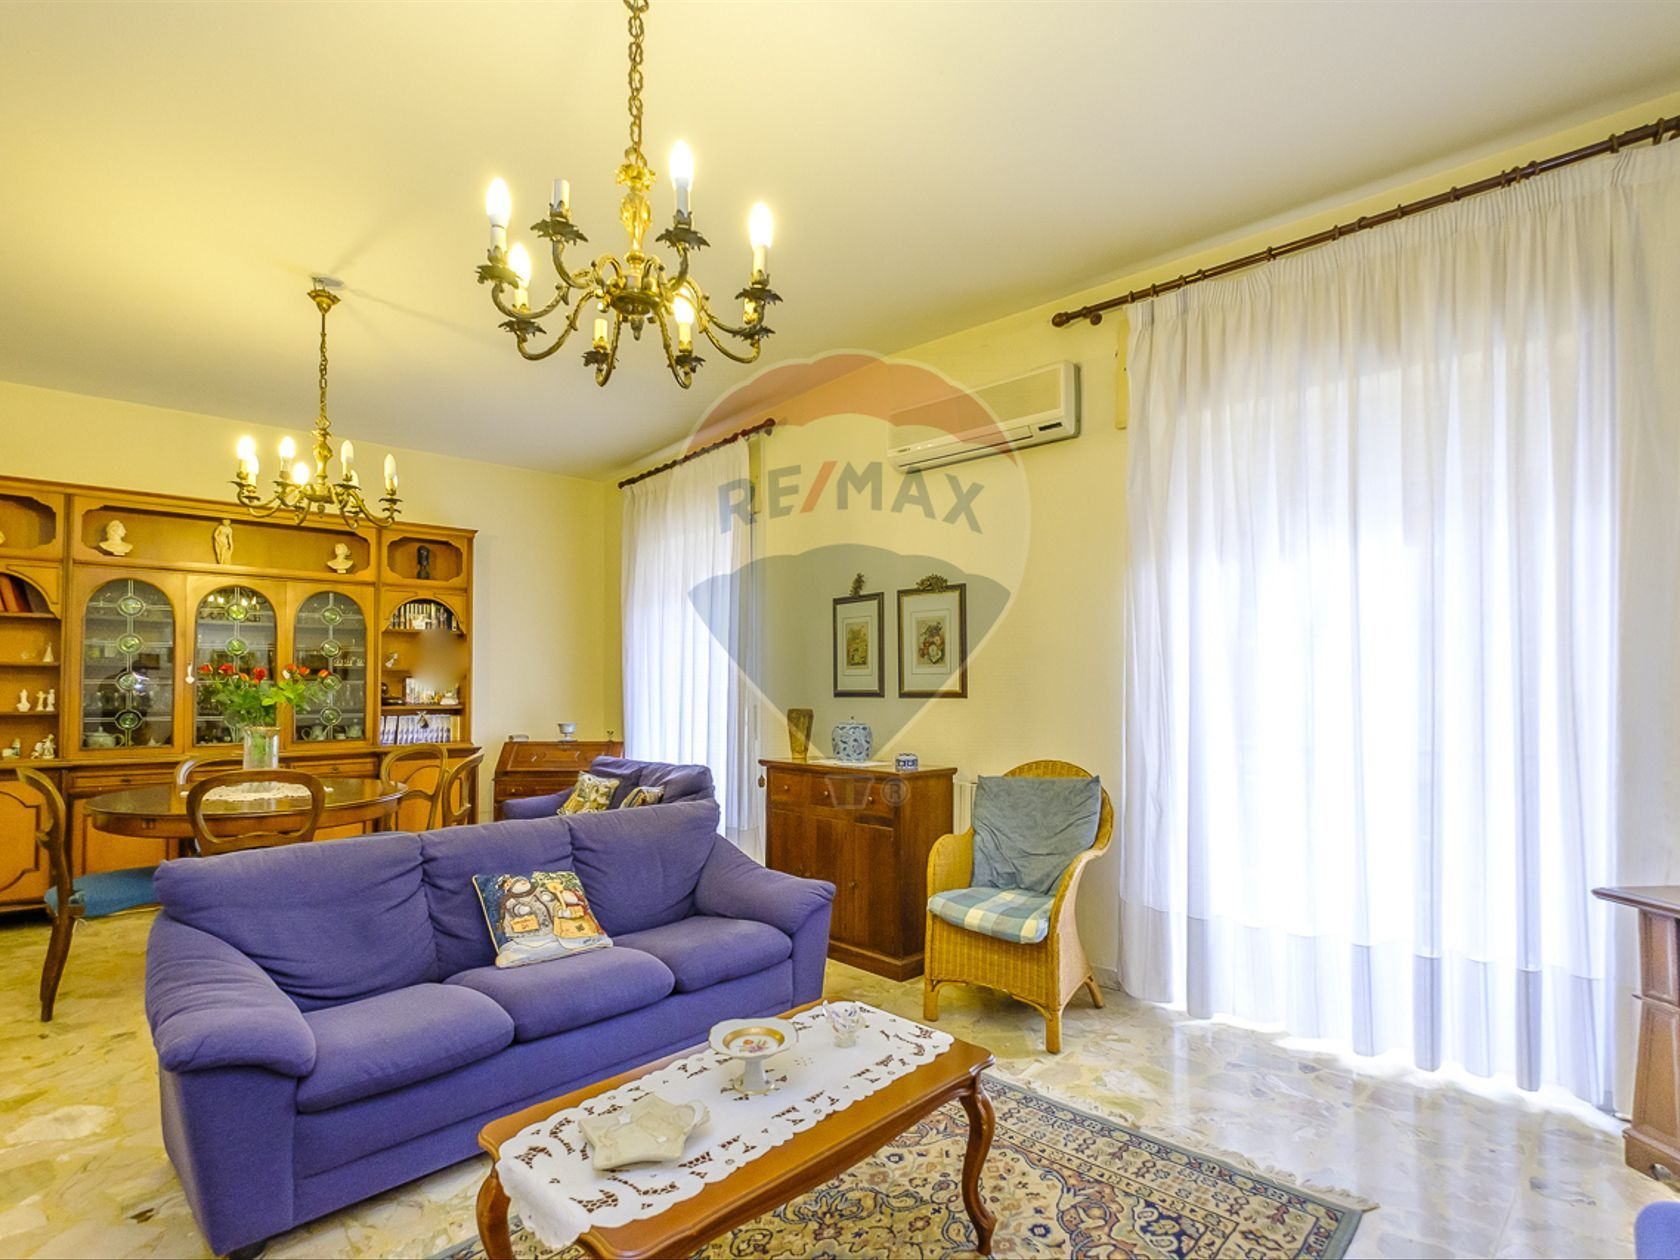 Appartamento Siracusa- Scala Greca S. Panagia Teracati Zecchino, Siracusa, SR Vendita - Foto 4